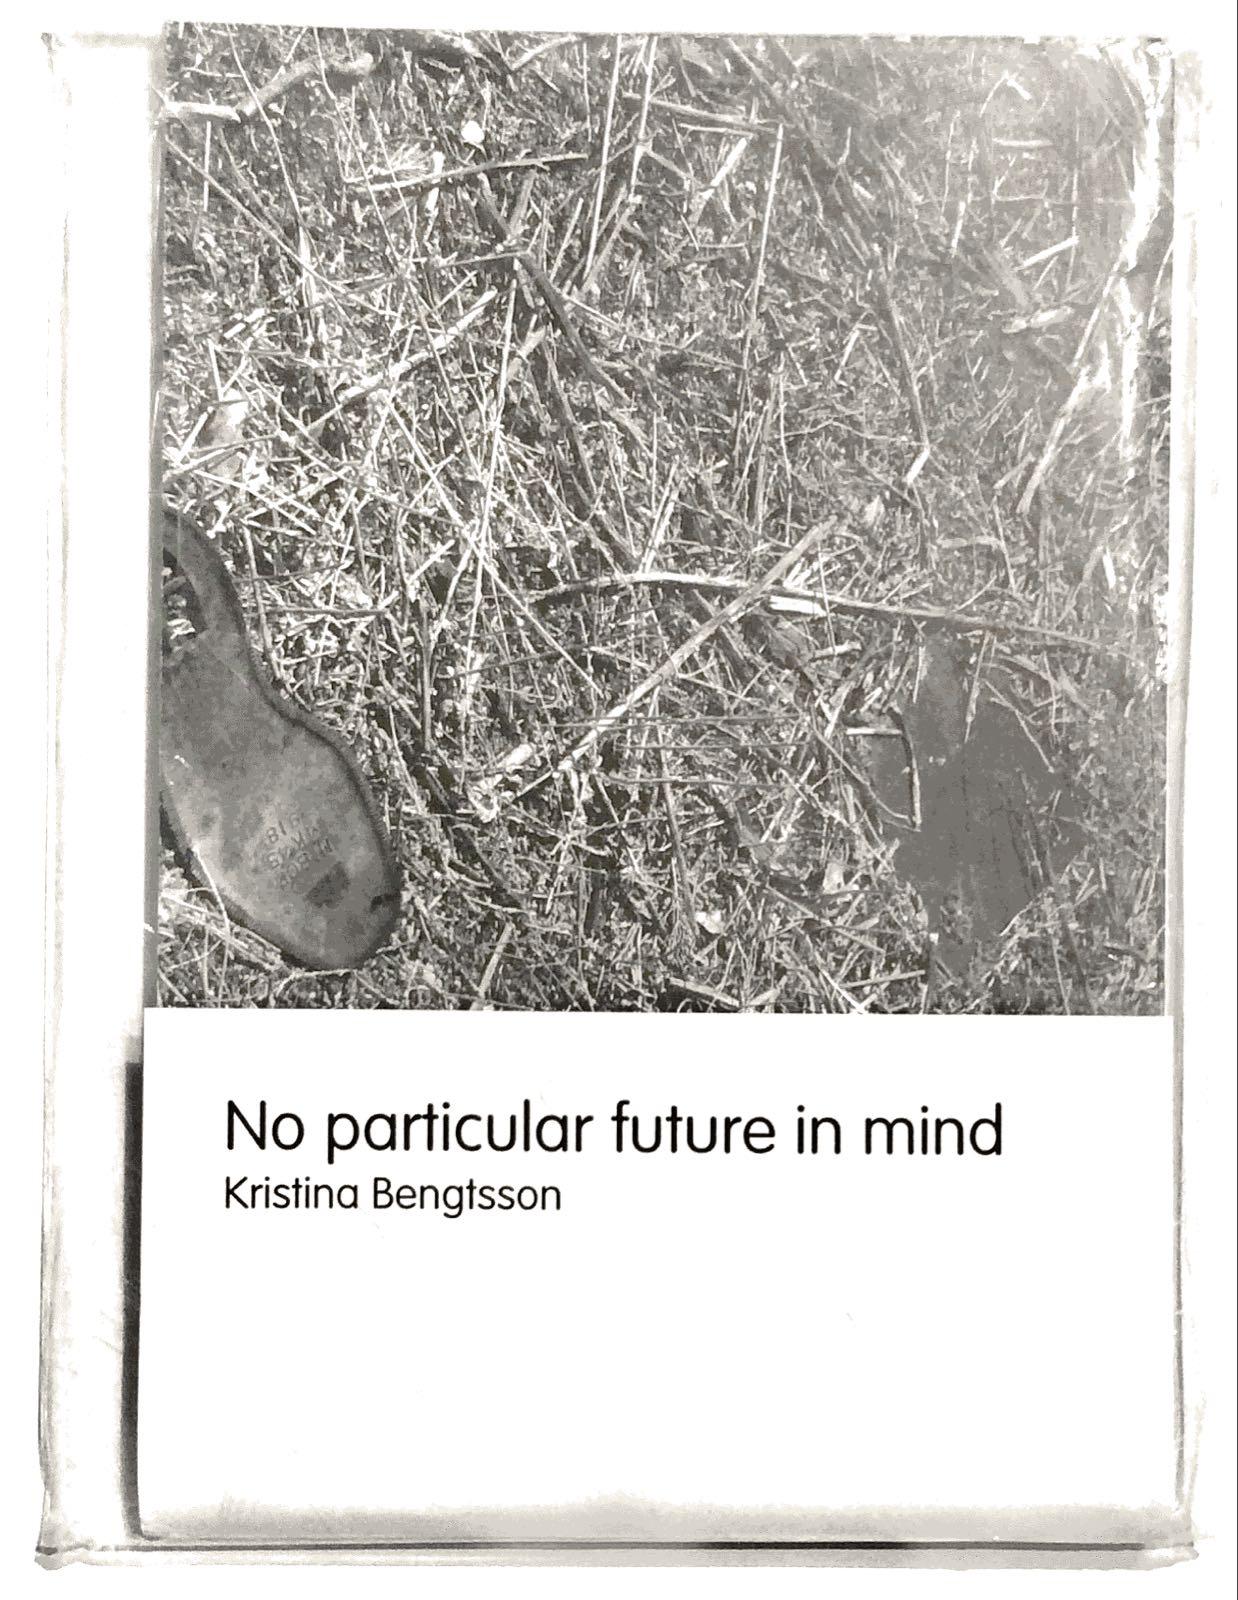 Bengtsson, Kristina. No particular future in mind